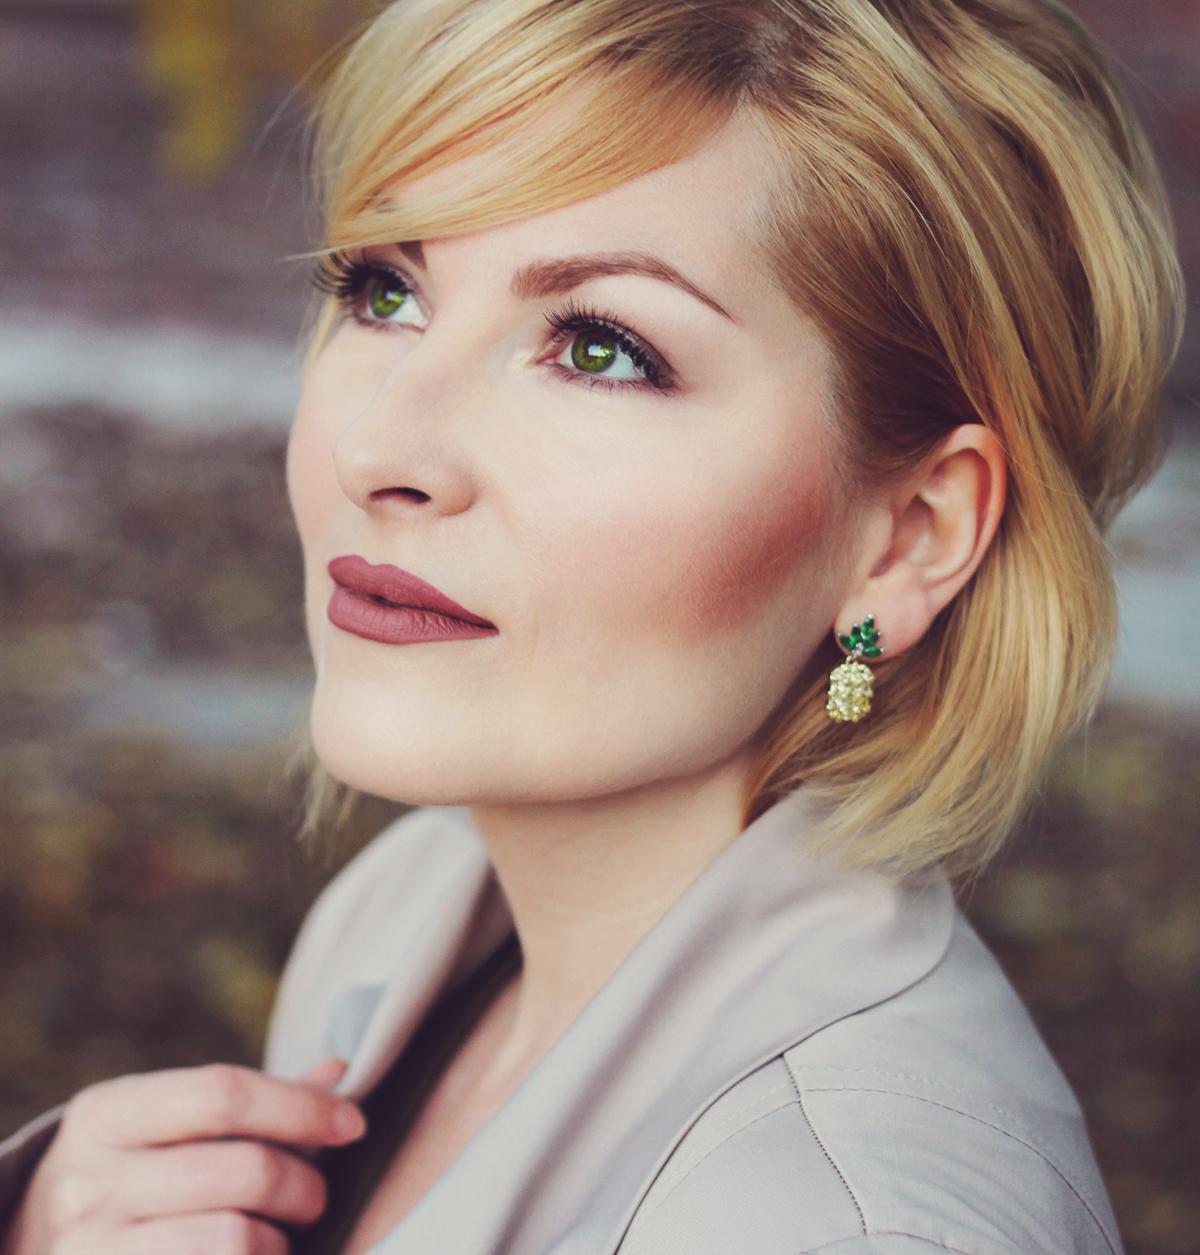 rosegal rhinestone pinneapple earrings, matte lips, earth tone makeup for green eyes